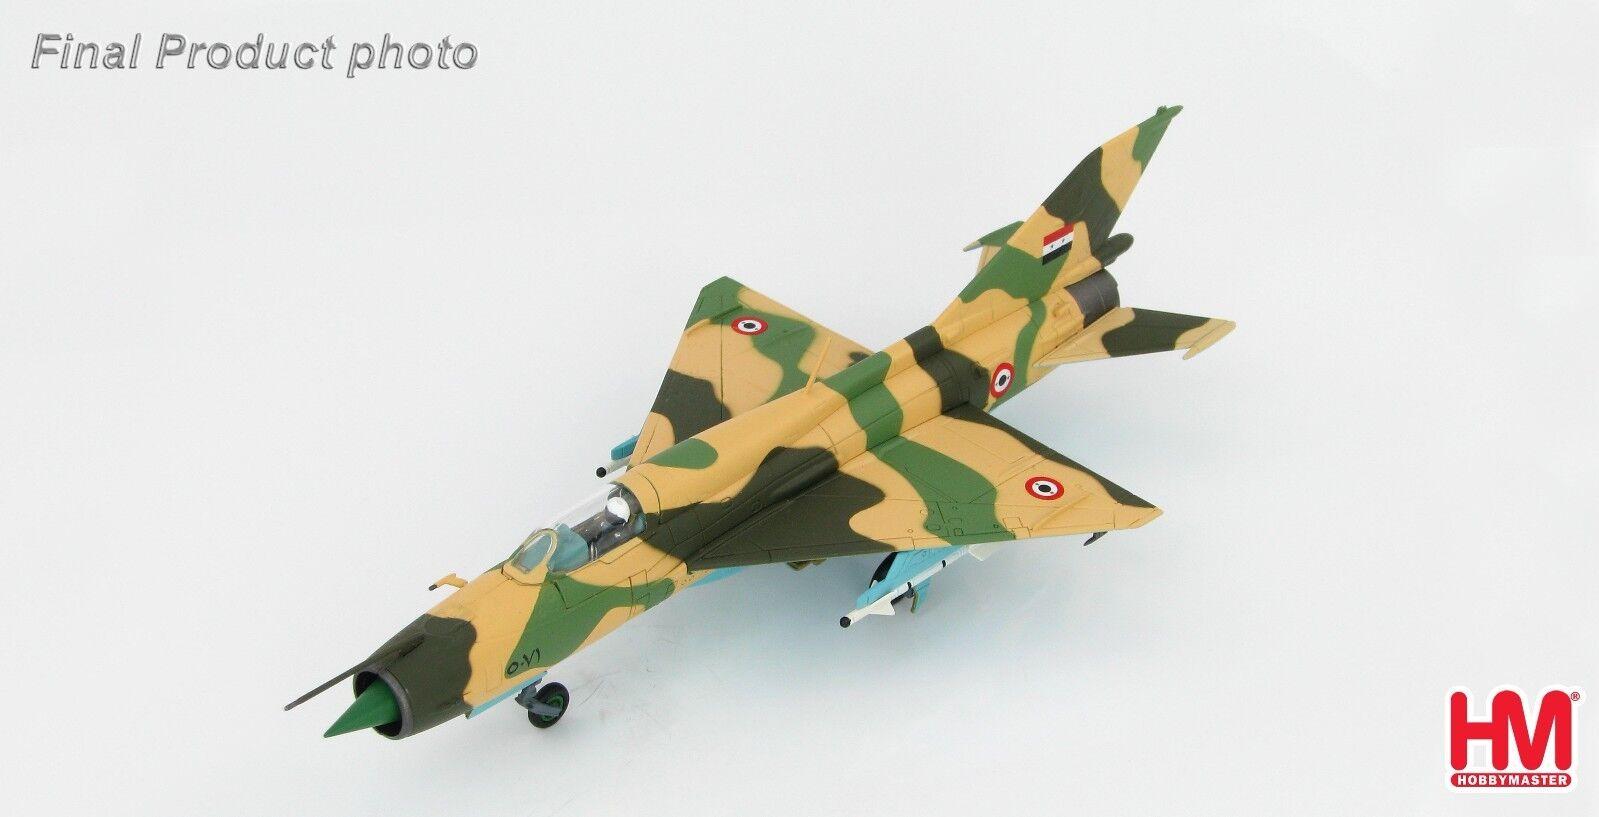 MiG-21FL Fishbed-D  5081 Egyptian Air Force Six Day War 1967 Hobbymaster HA0190